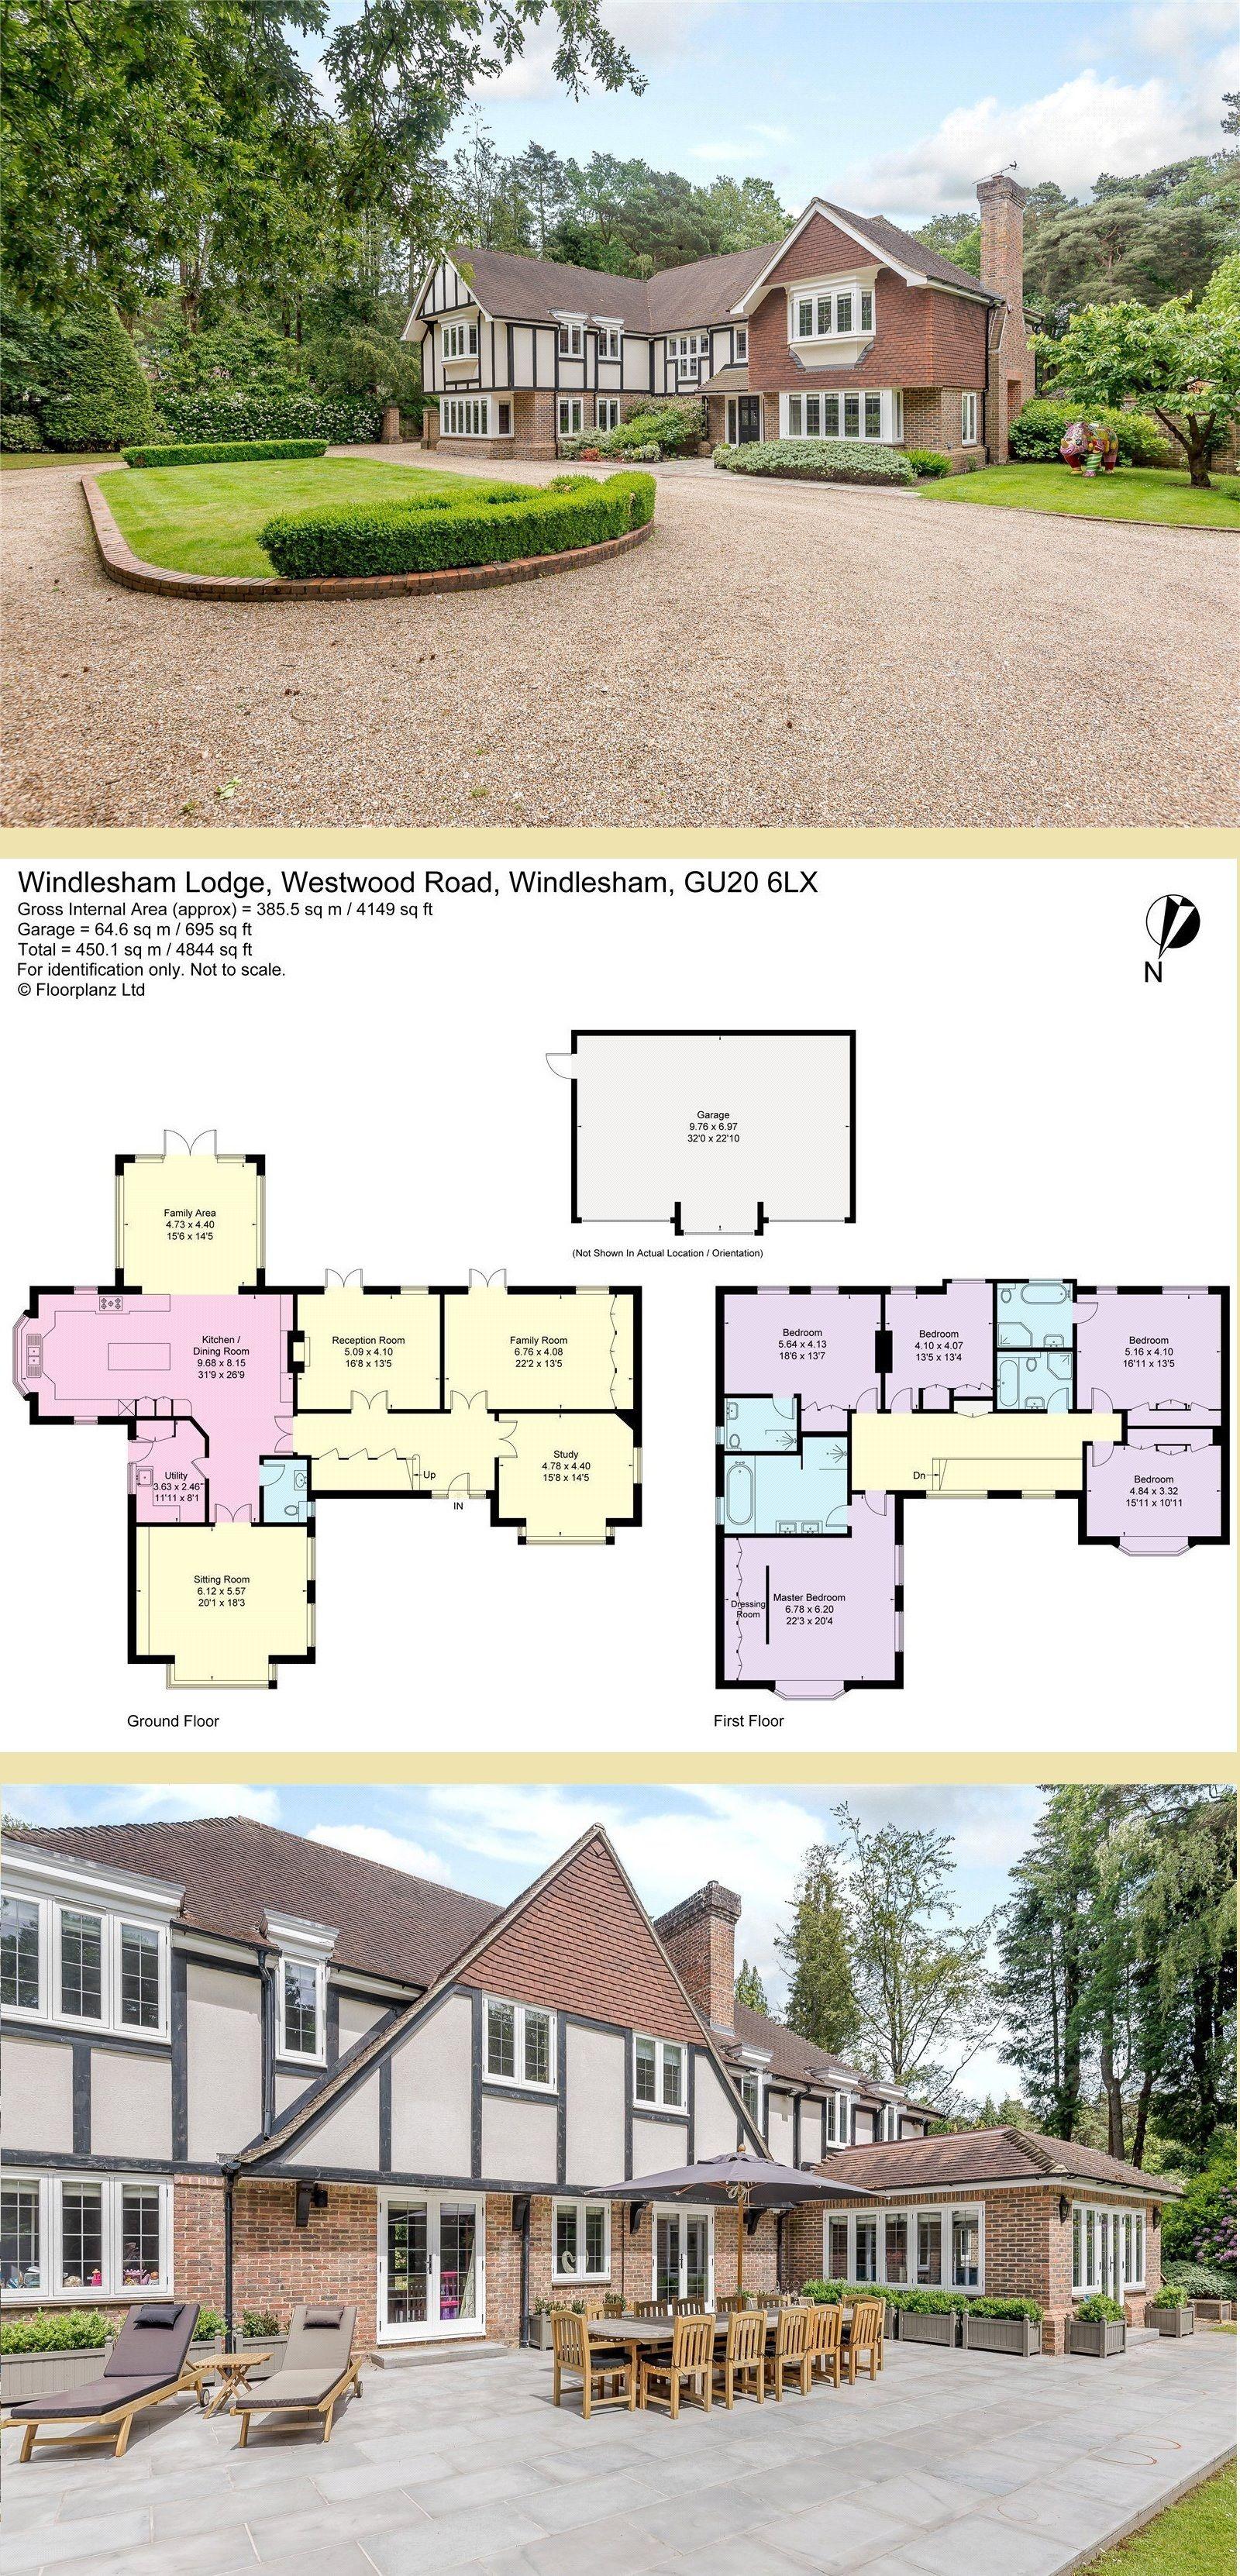 Windlesham Lodge Westwood Road Windlesham Surrey Victorian House Plans Architecture Exterior Modern House Plans